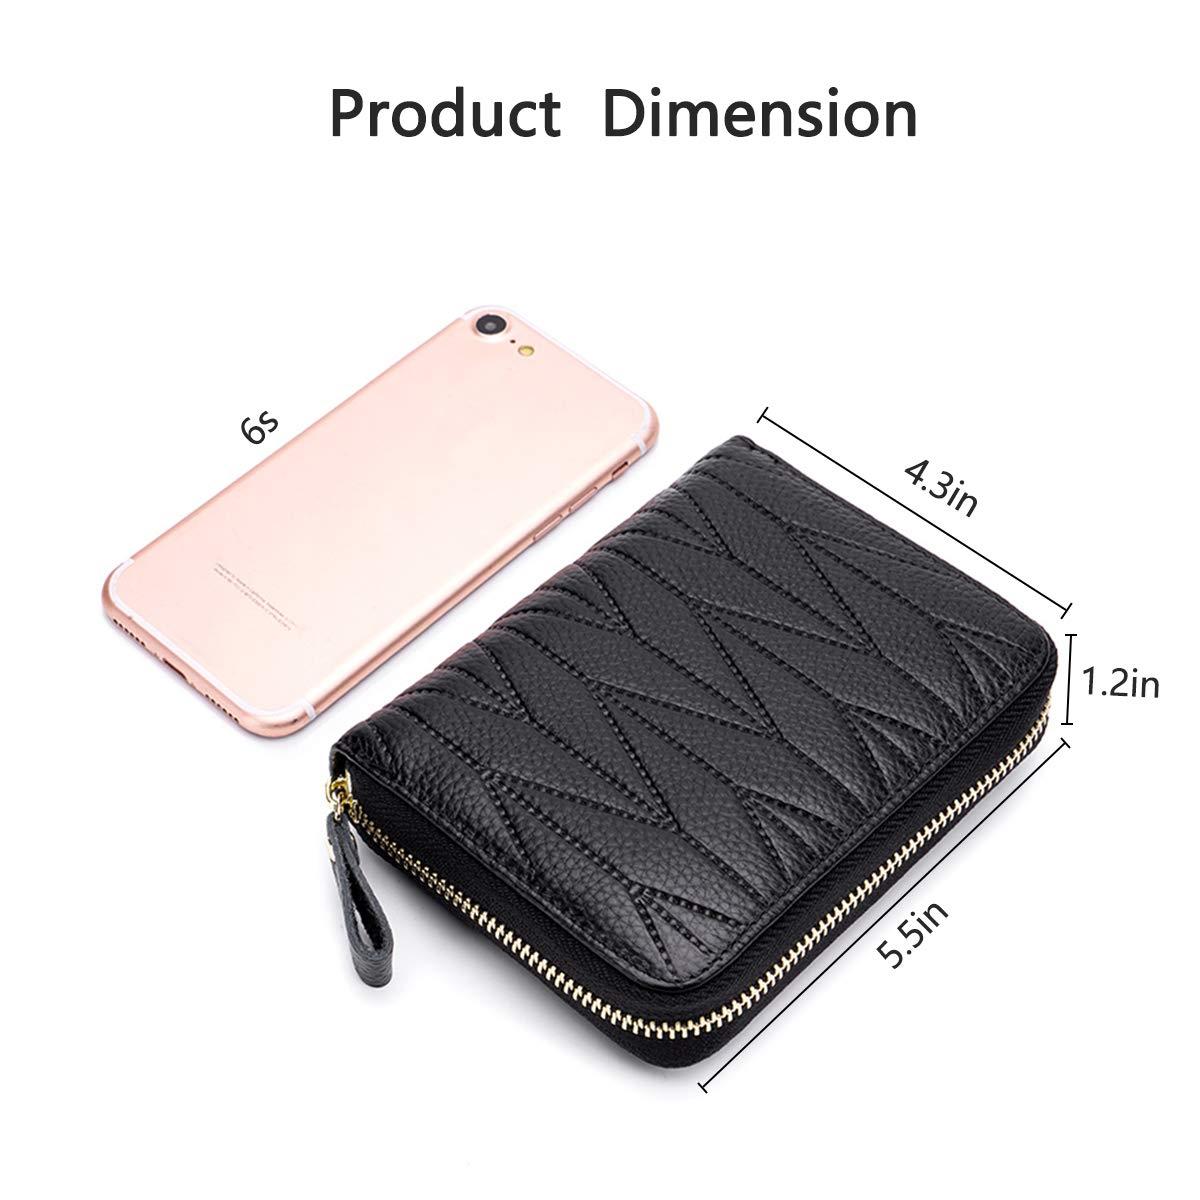 imeetu Women/men RFID Blocking Leather Credit Card Holder case Accordion Wallet 24 Slots Purses with Zipper Pocket(Wine Red) by imeetu (Image #7)